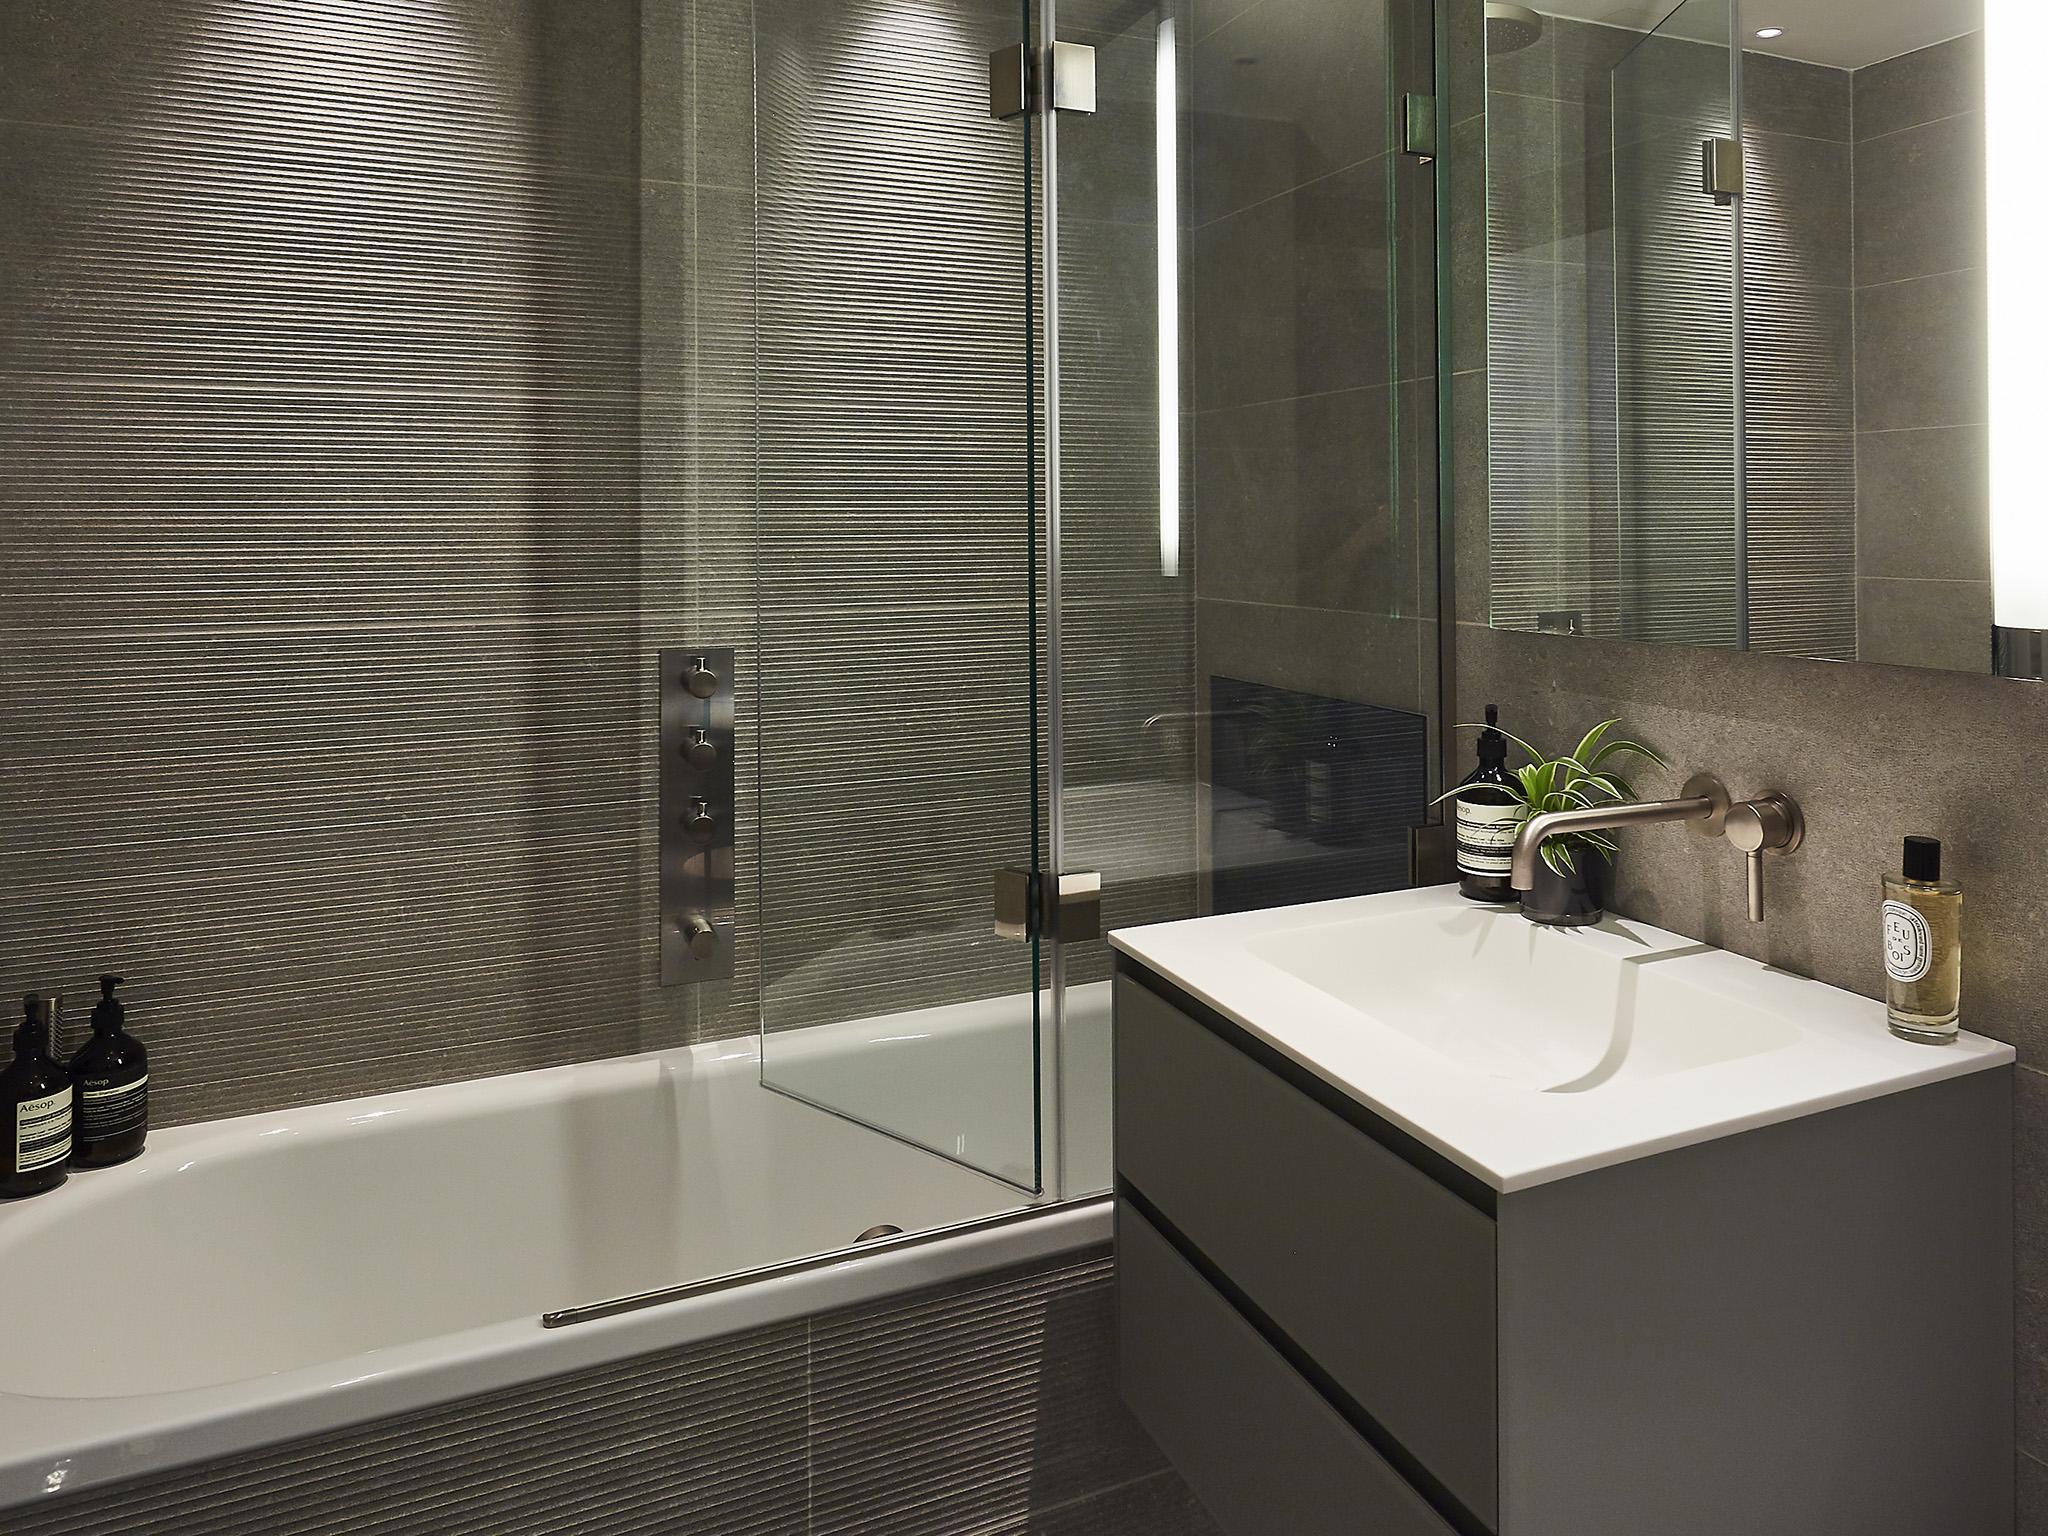 Bathroom Designs For S Html on decorating styles 1930 s, tile desgins 1930 s, bathroom tile designs from 1930,